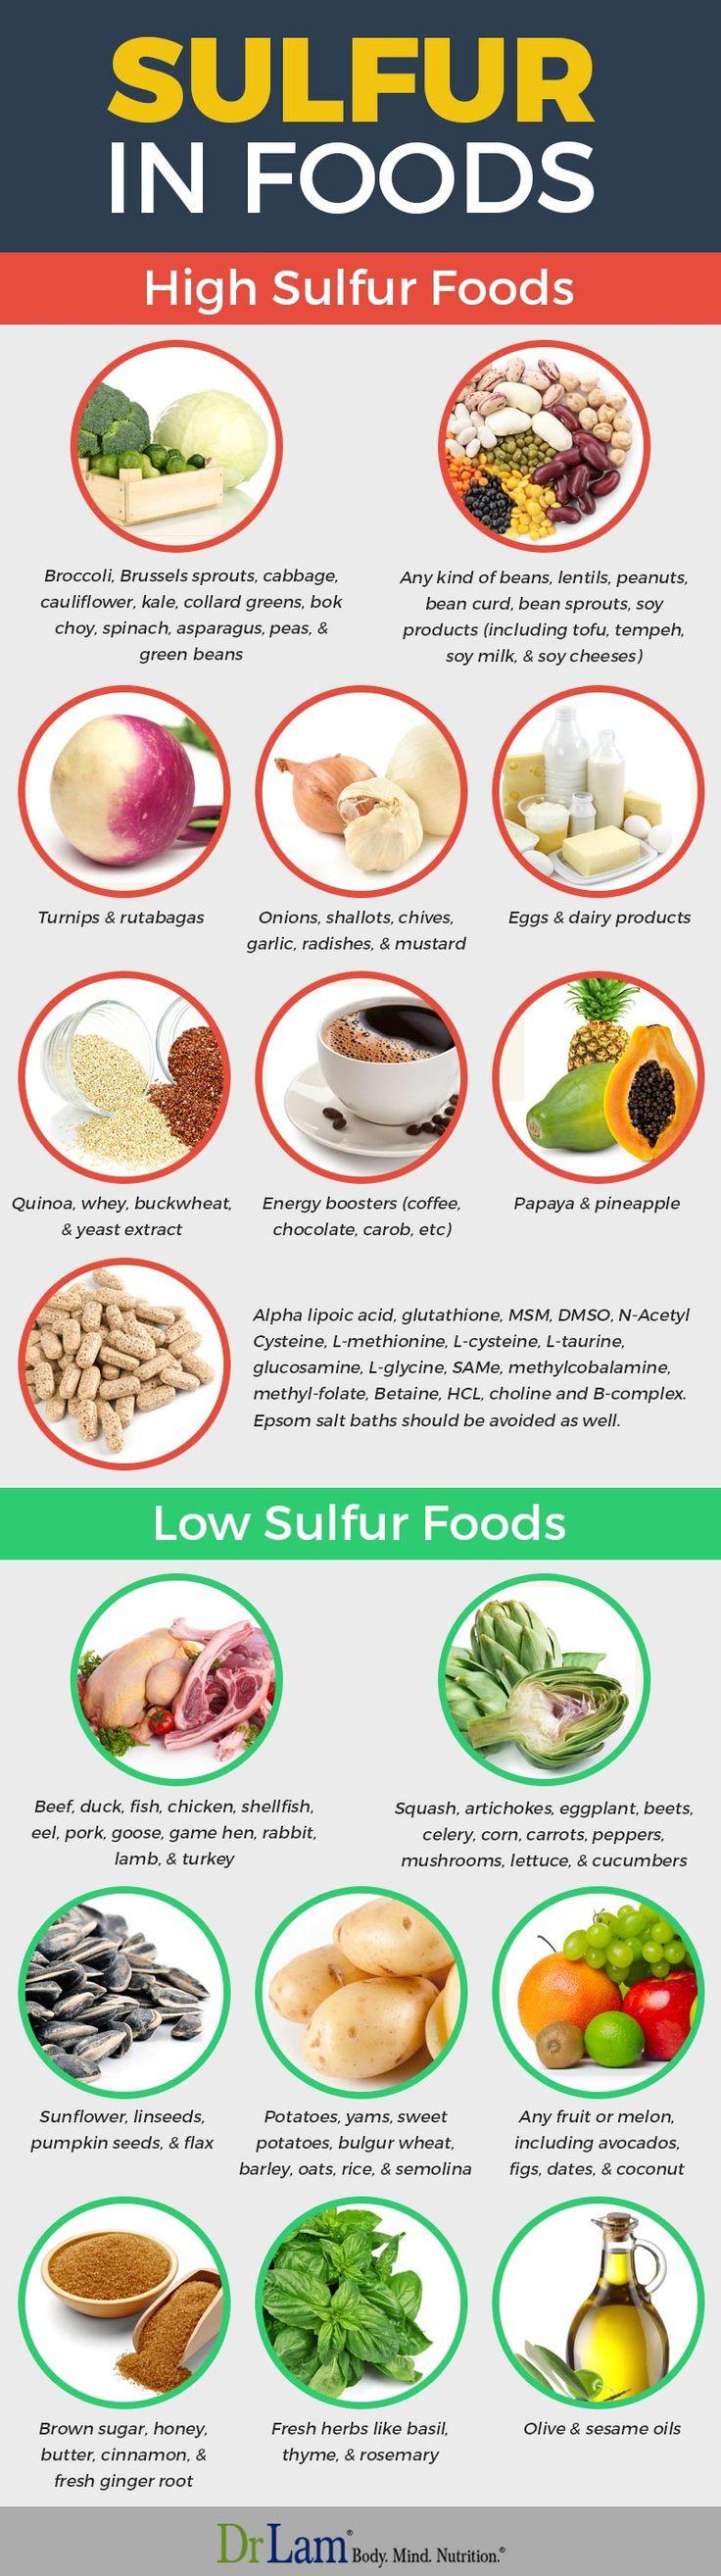 Low Sulfur Foods